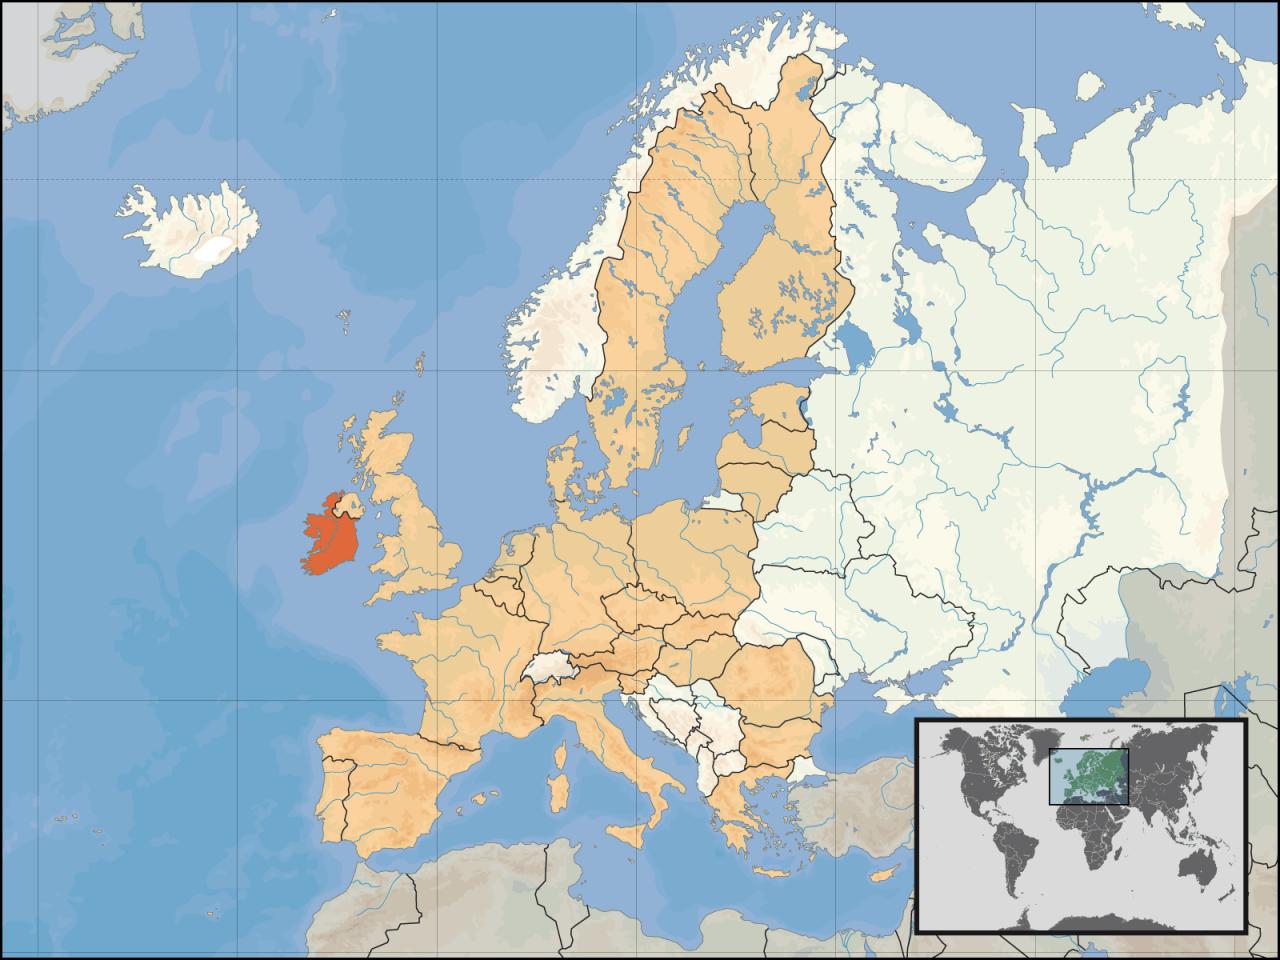 Lokalizacja Irlandii na tle Europy